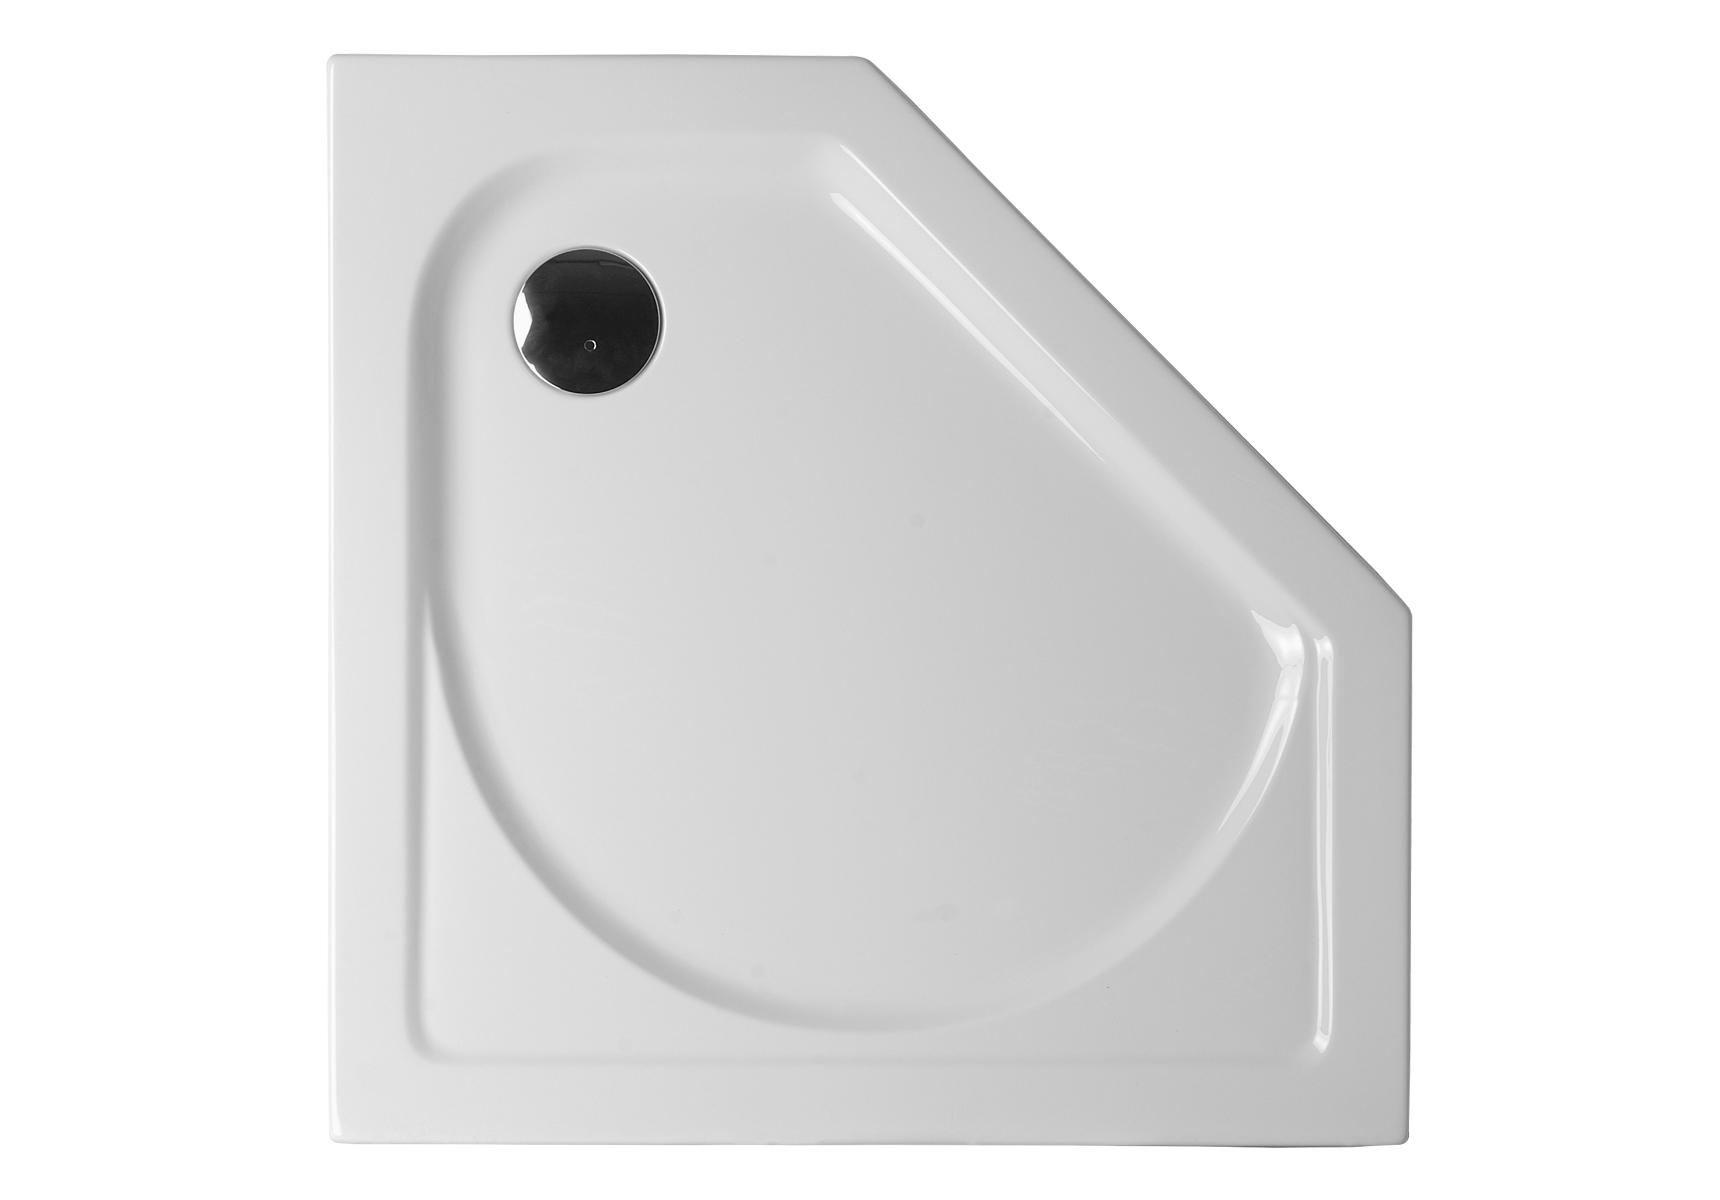 Integra receveur ultra plat en acrylique, pentagonal, 100  x  100 cm